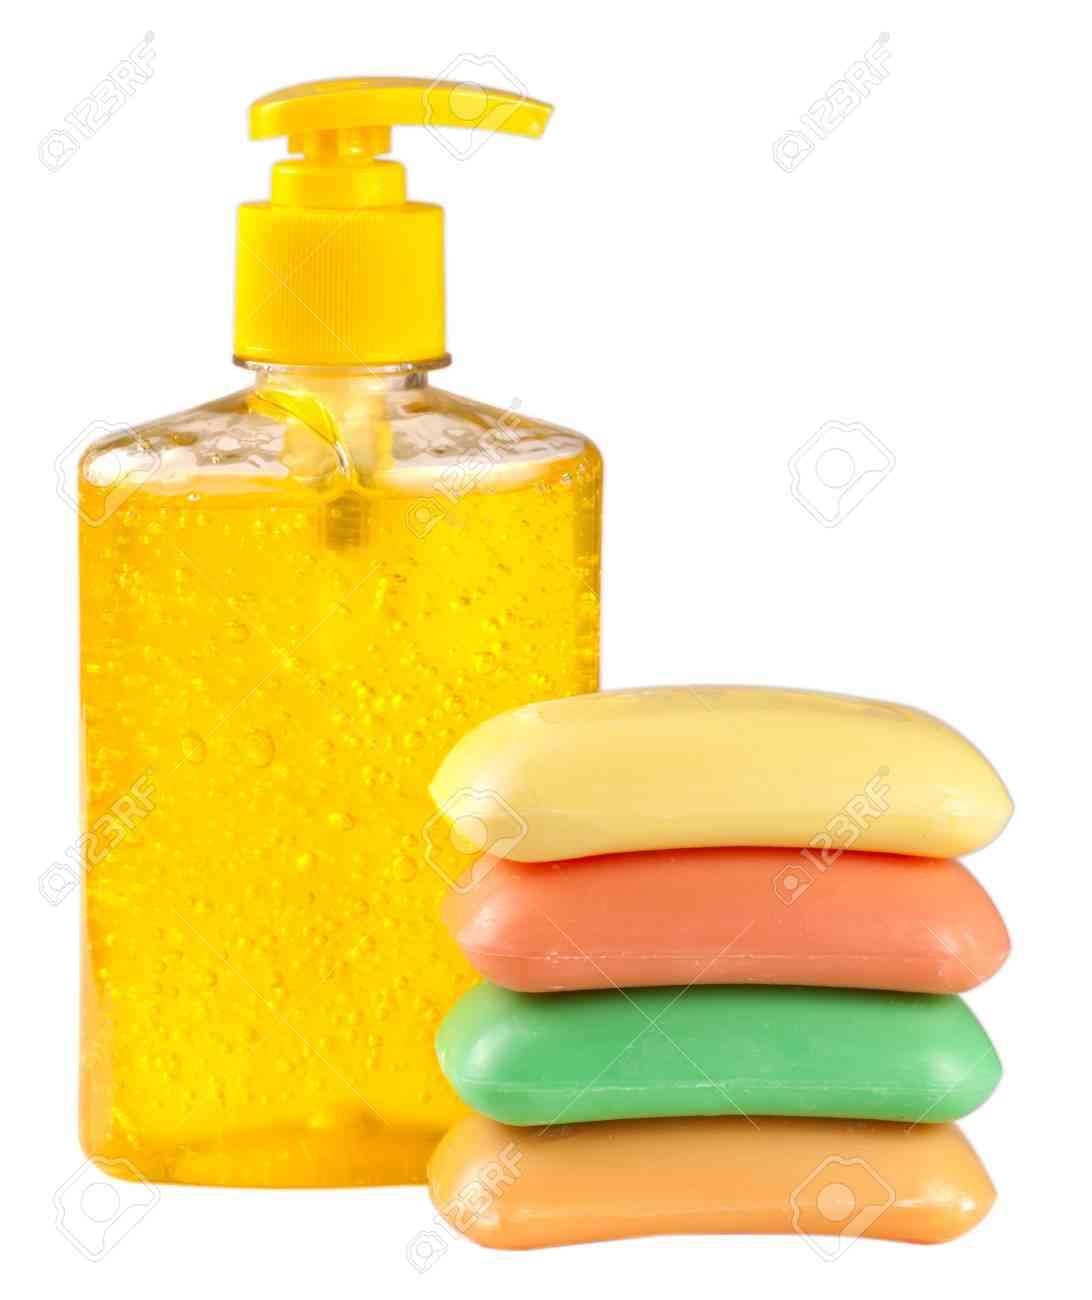 un geste simple savon liquide ou savon solide